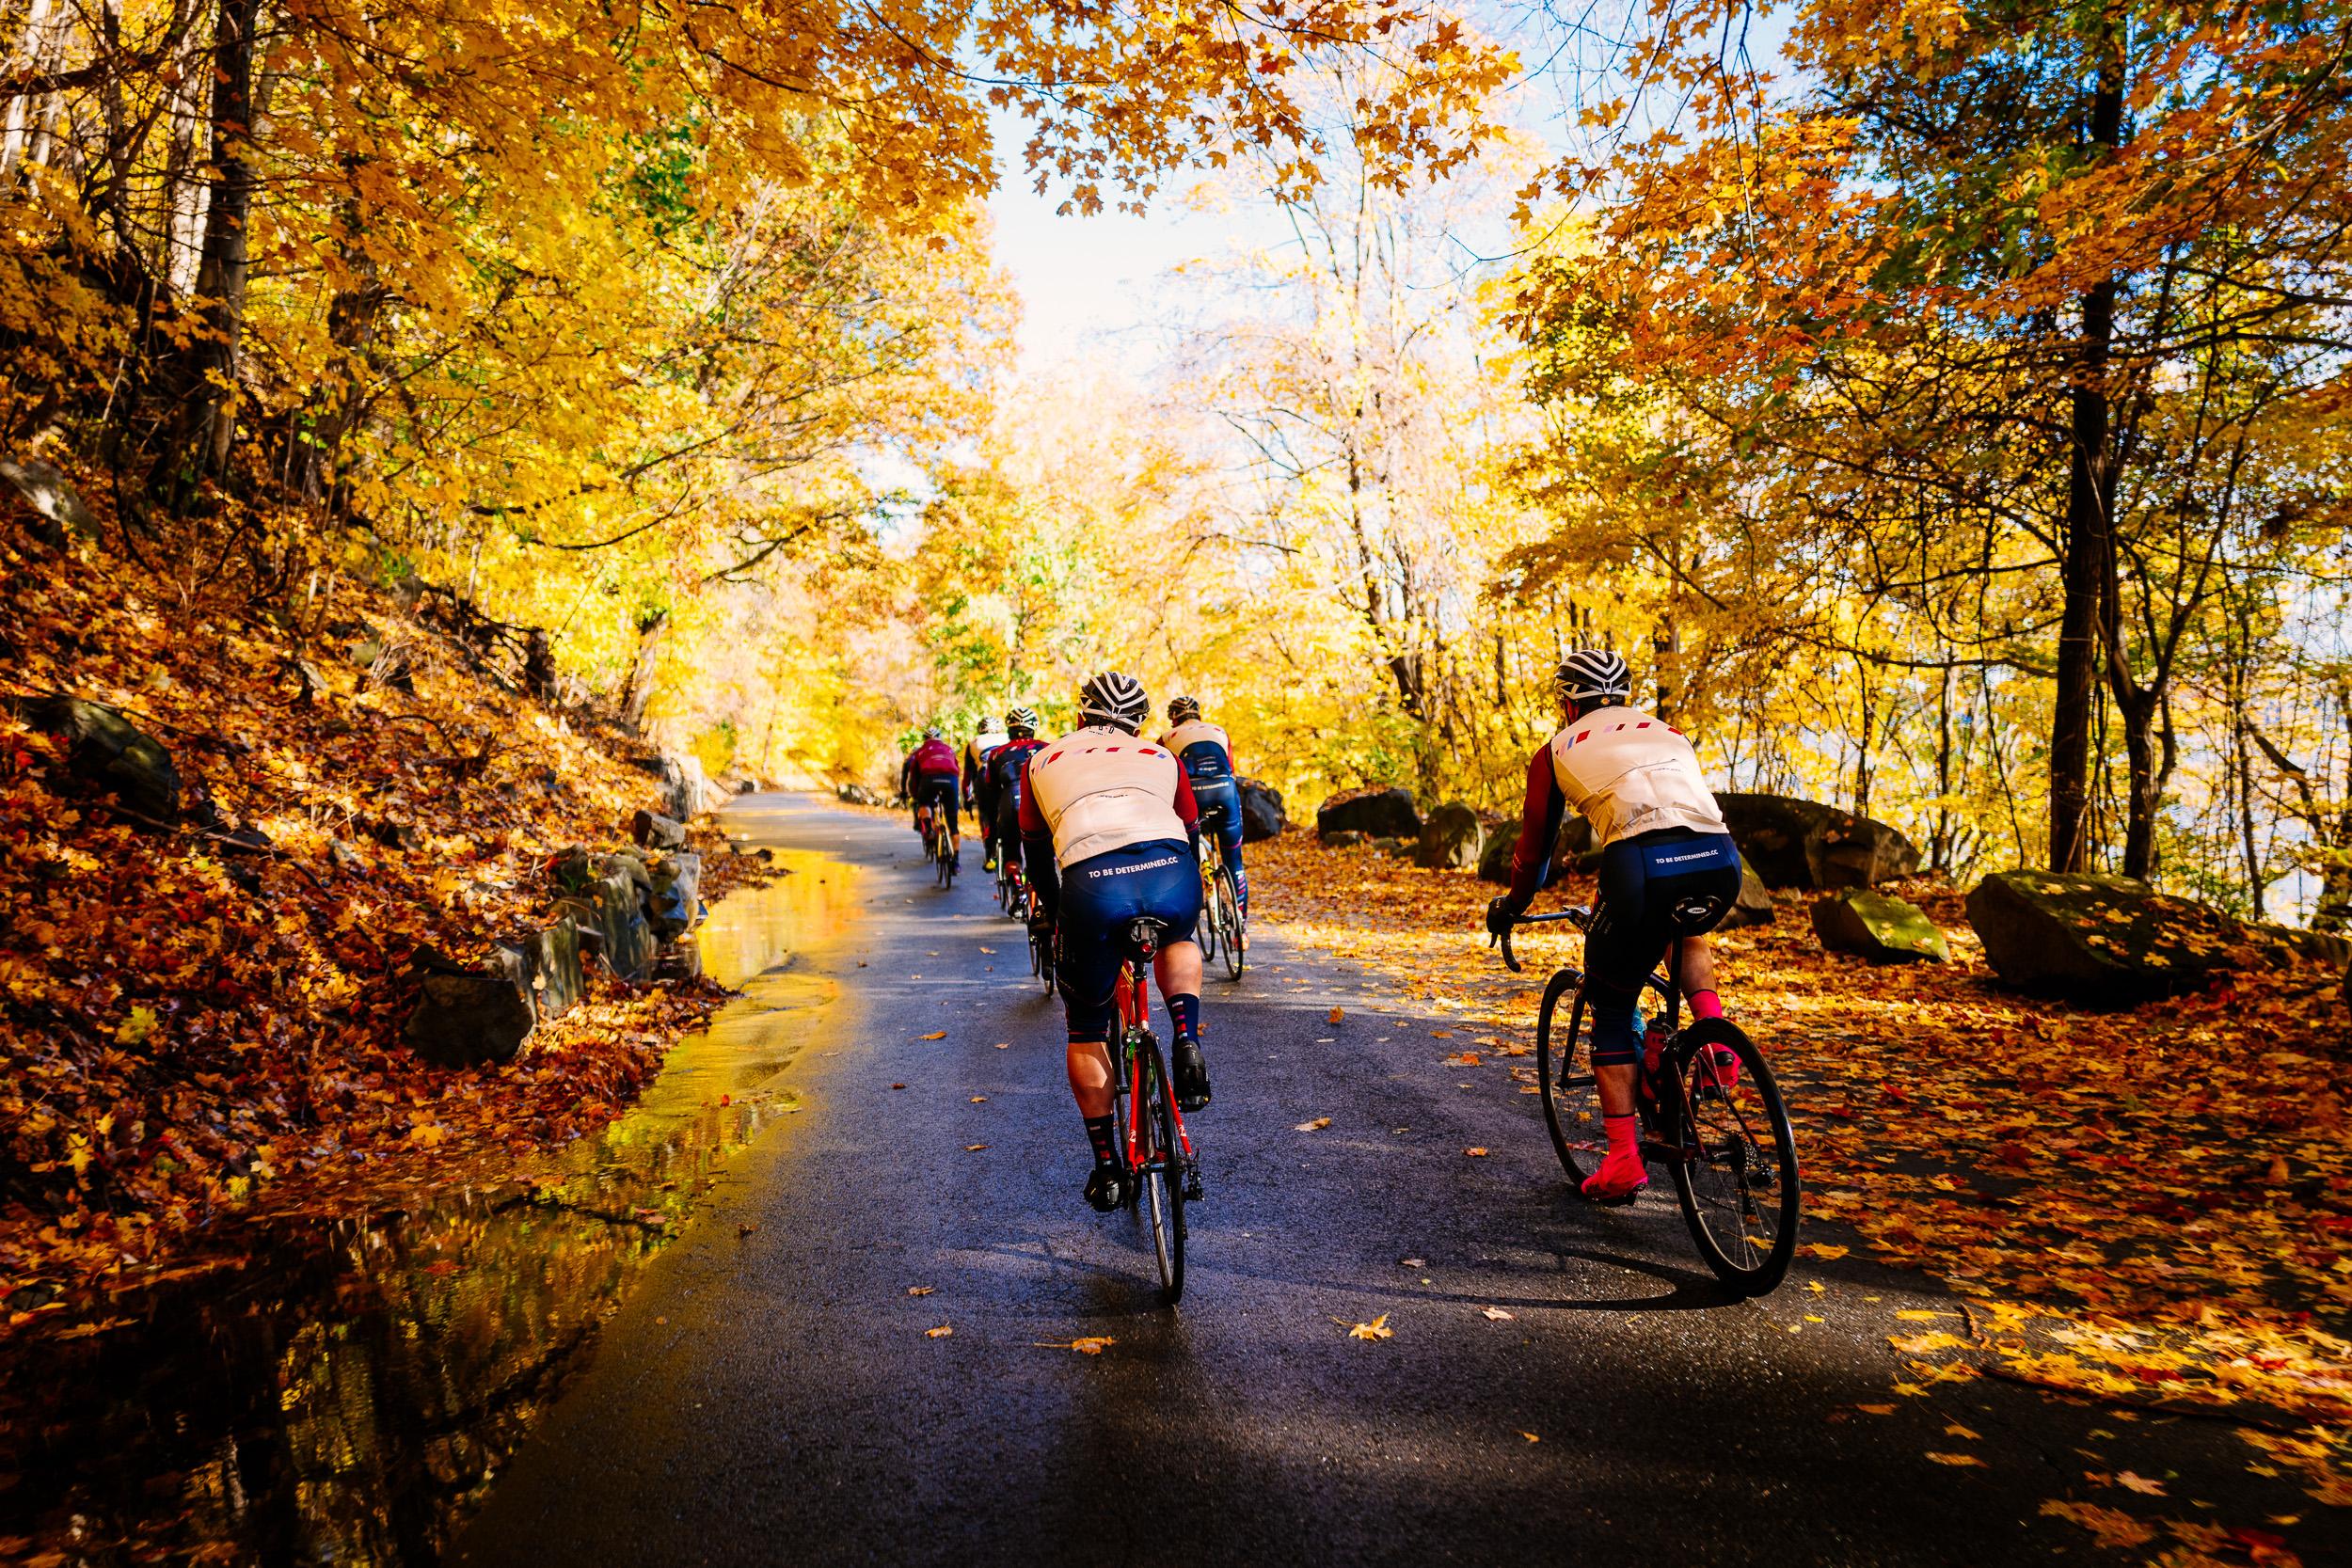 photo-rhetoric-to-be-determined-river-road-fall-foliage-5019.jpg